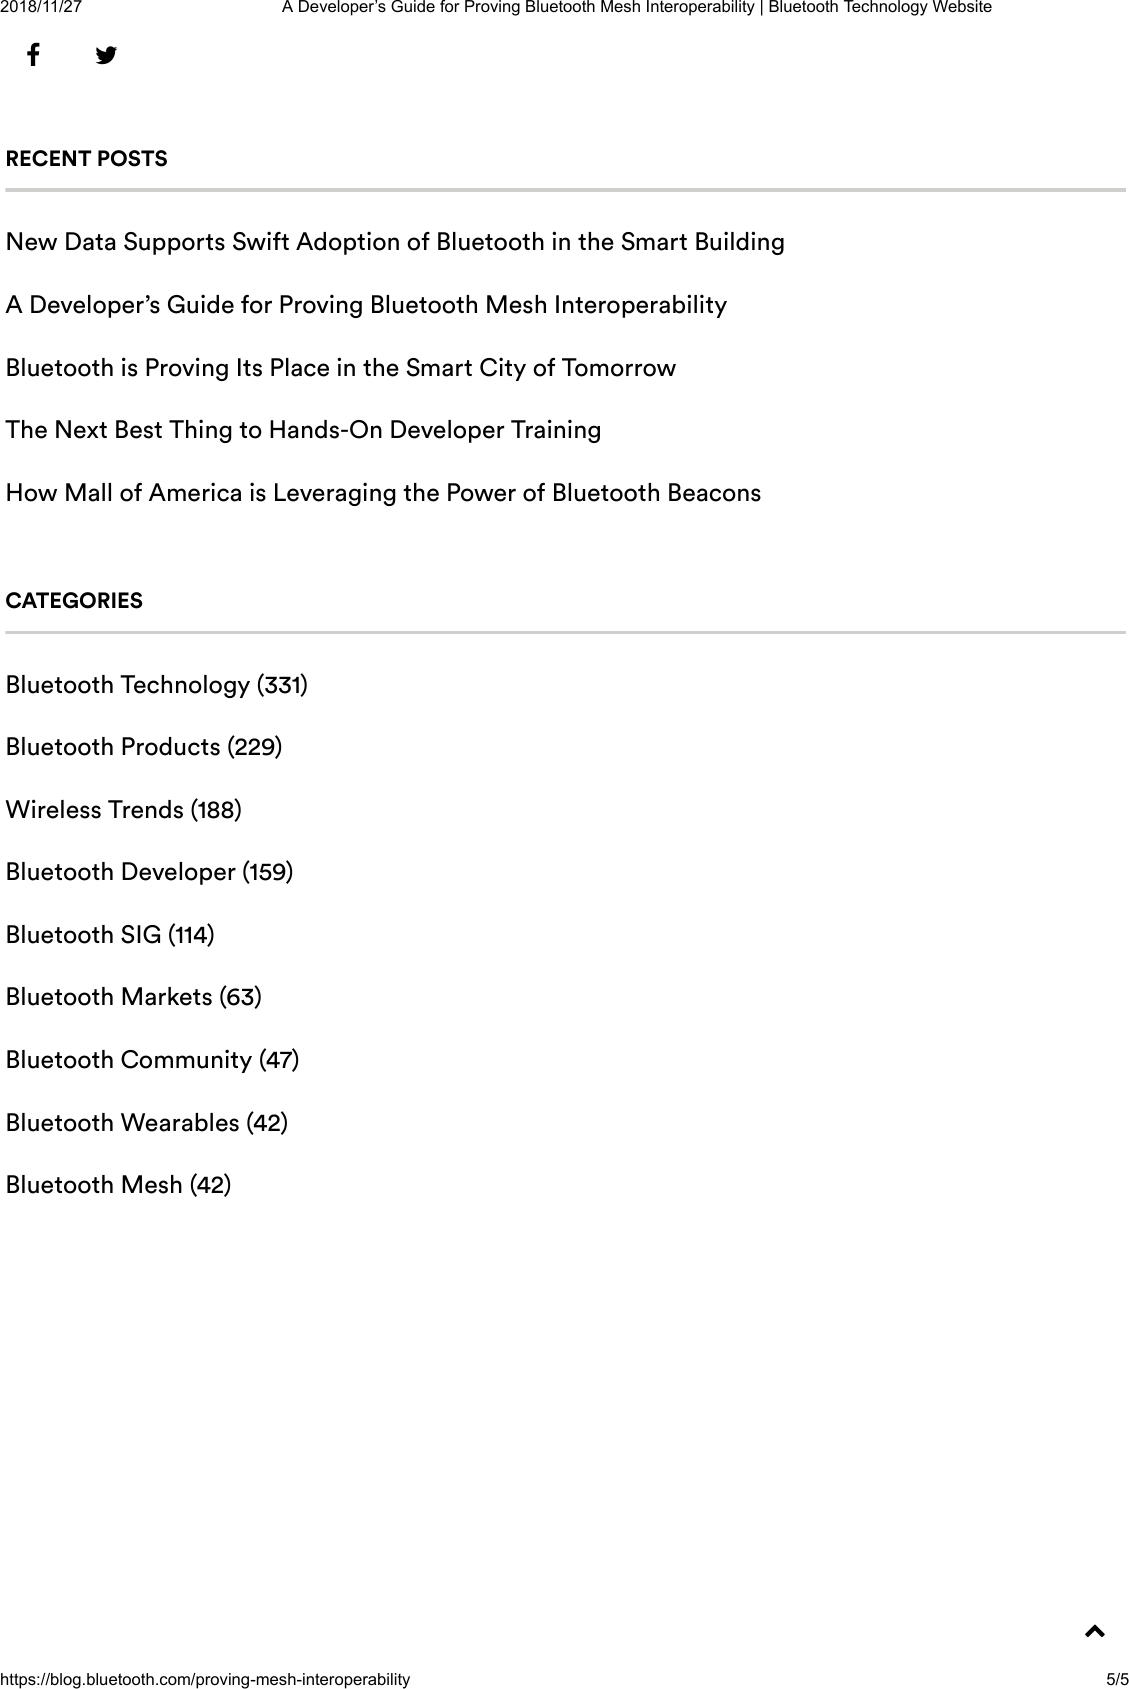 A Developer's Guide For Proving Bluetooth Mesh Interoperability